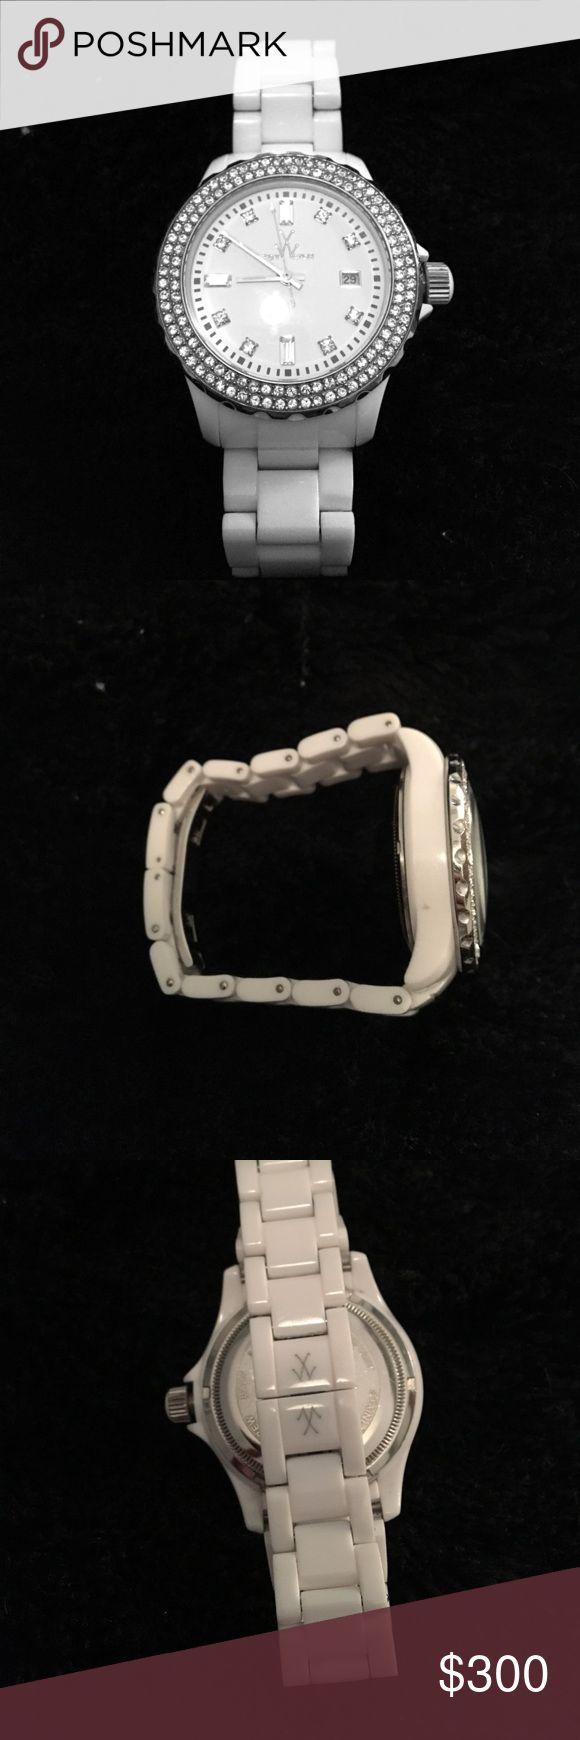 Toywatch plasteramic stone w/ Swarovski crystals Perfect condition. Never been worn Toywatch Accessories Watches